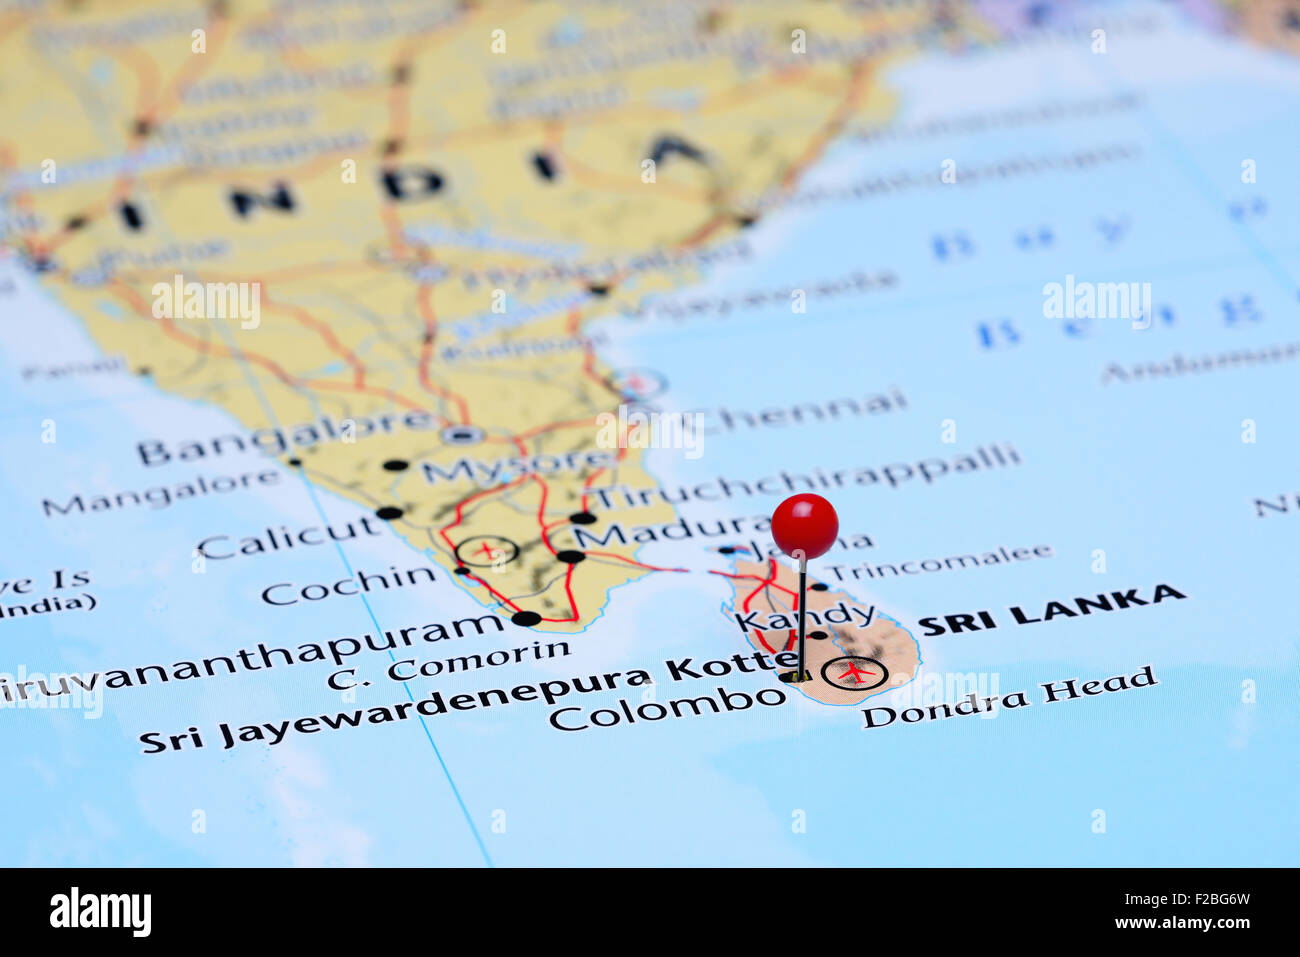 Sri Jayewardenepura Kotte pinned on a map of Asia Stock Photo